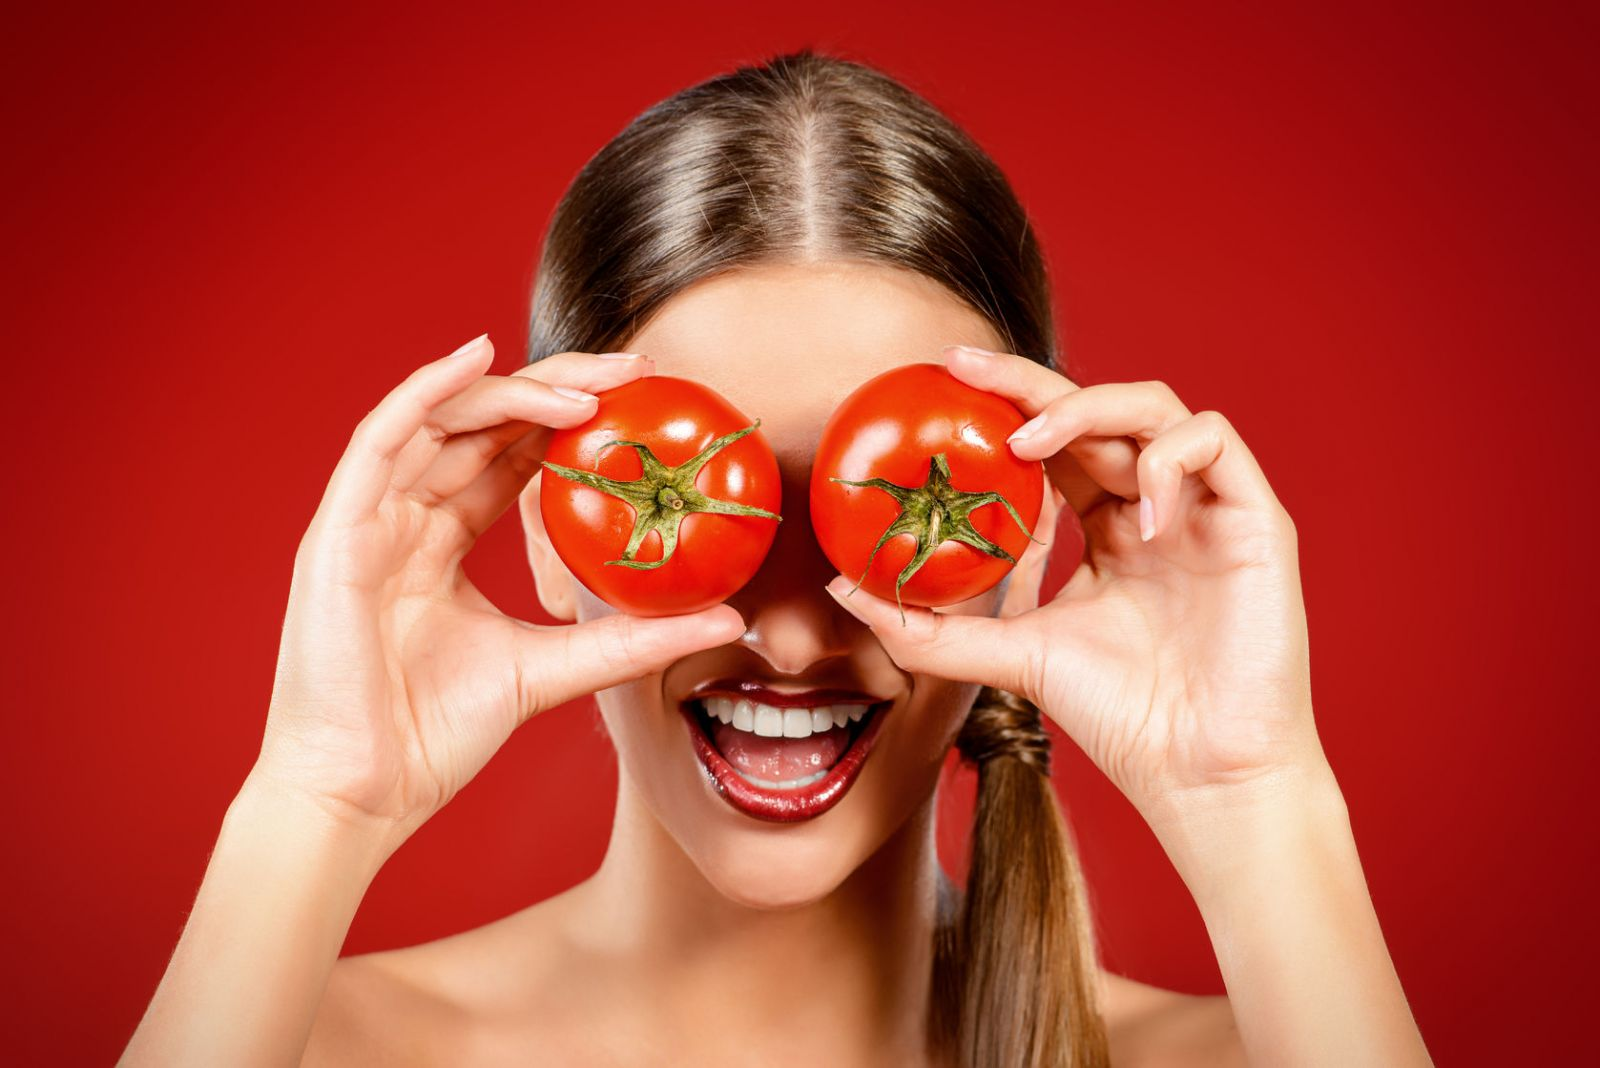 Cara Menghilangkan Jerawat Dengan Tomat Dan Mentimun